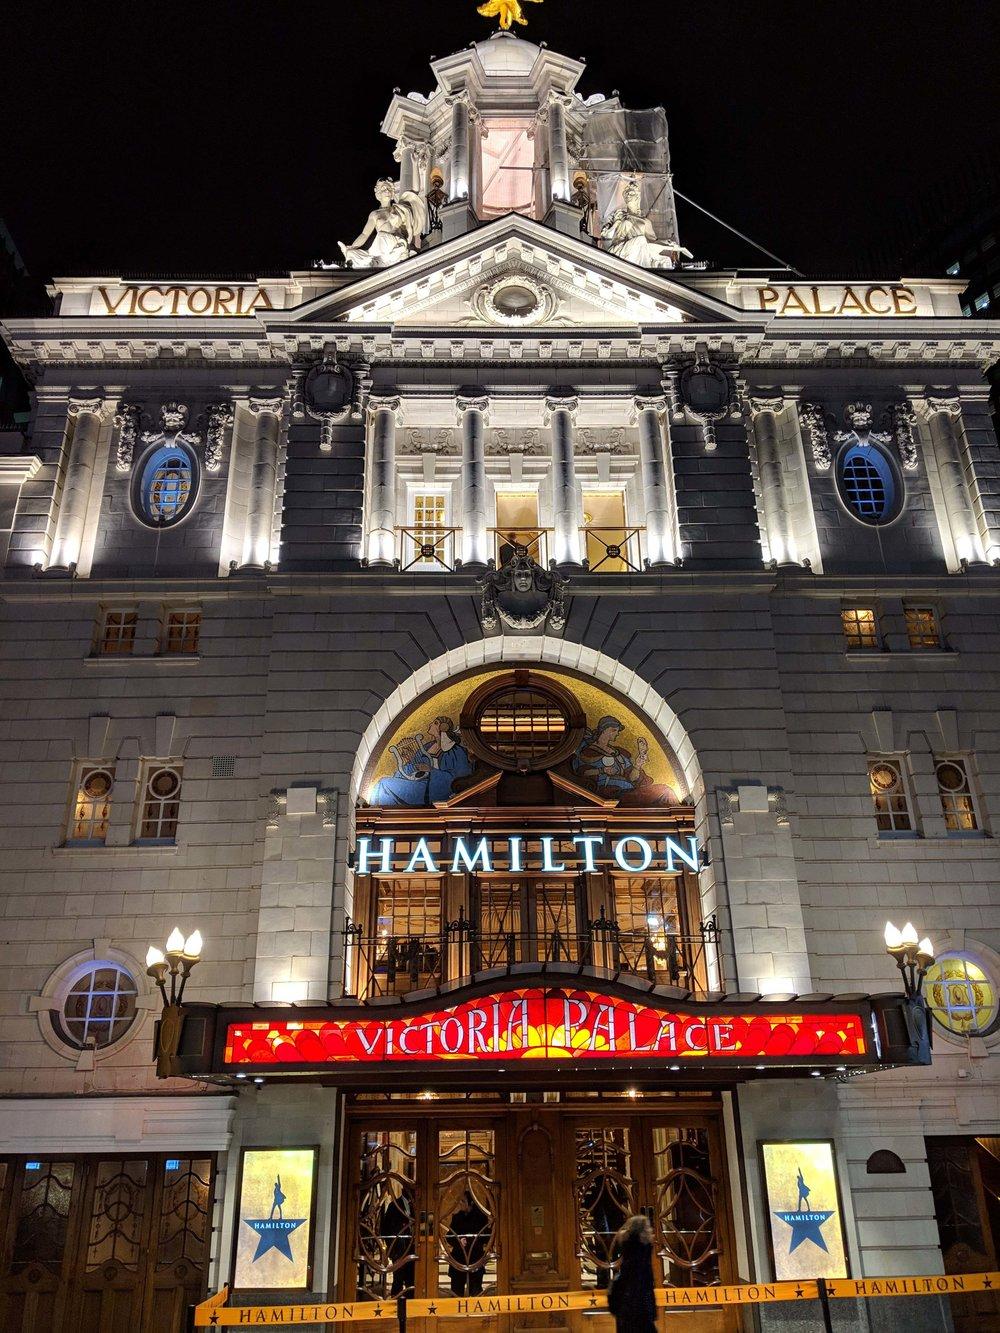 Hamilton… Have you heard of it?